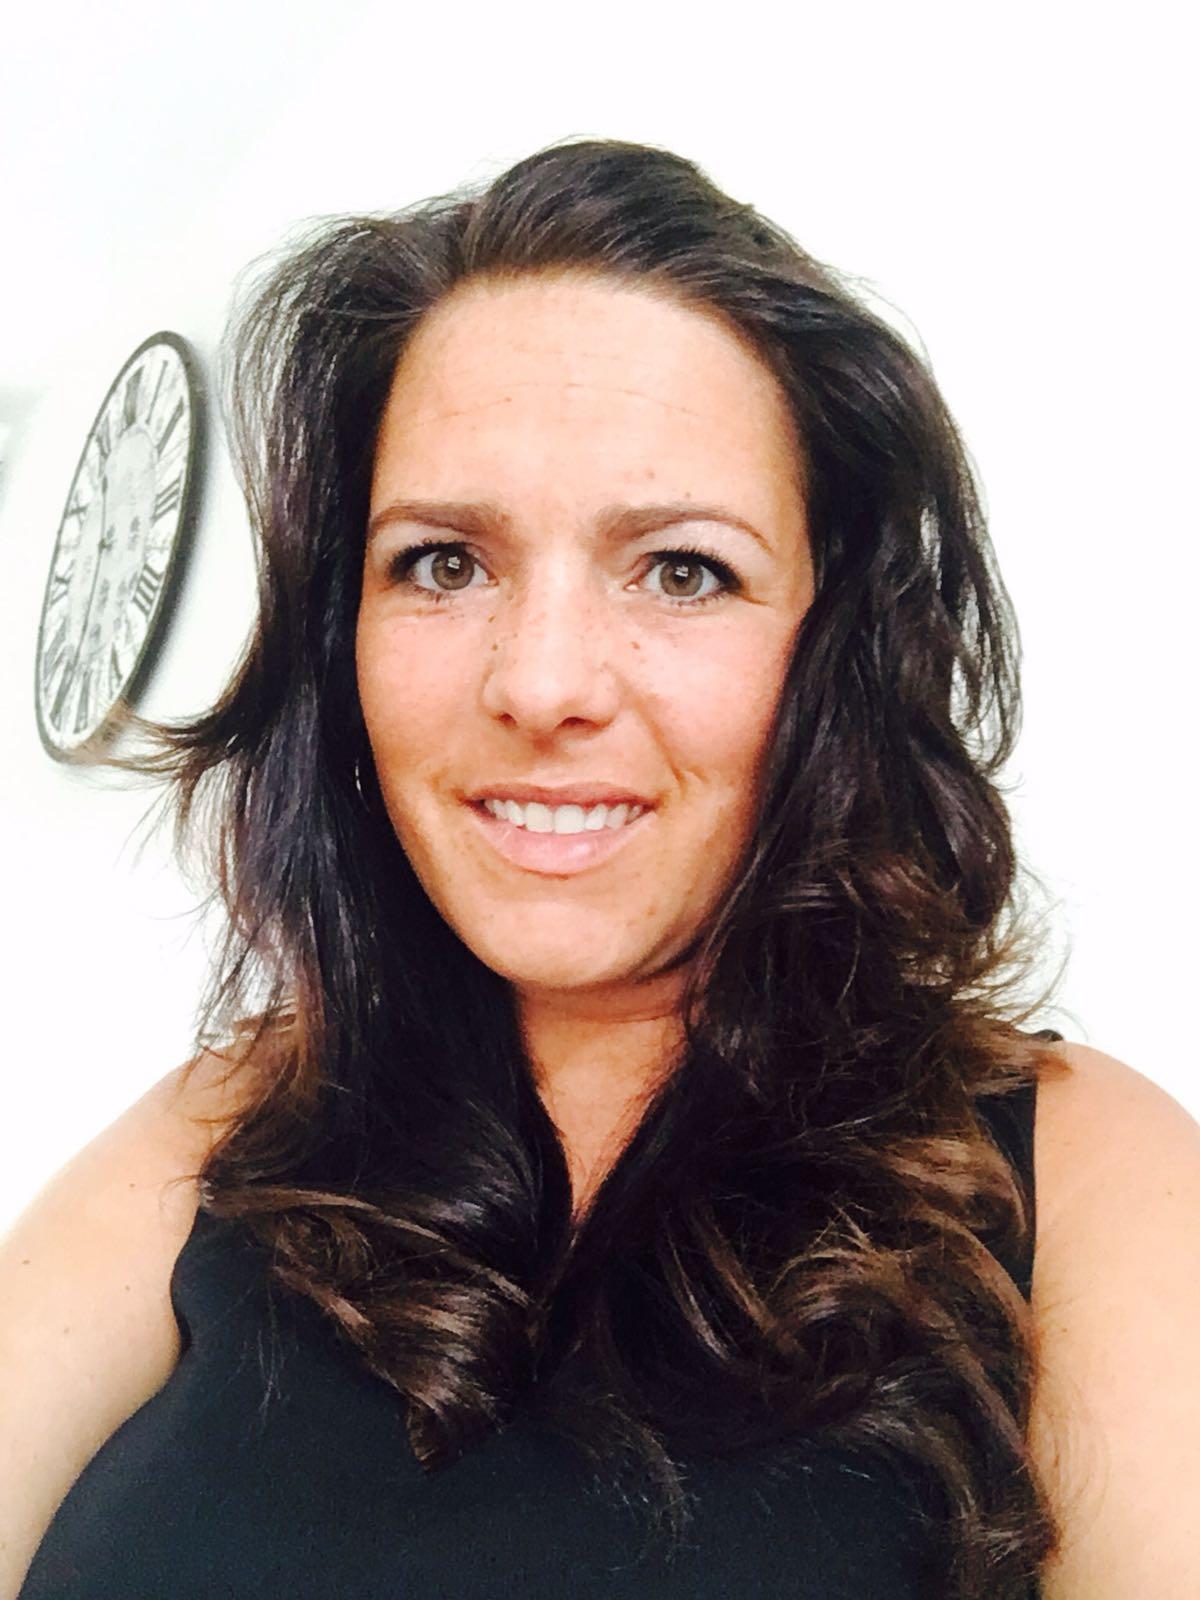 Kimberly - Kapper bij Hair With Compliments Breda